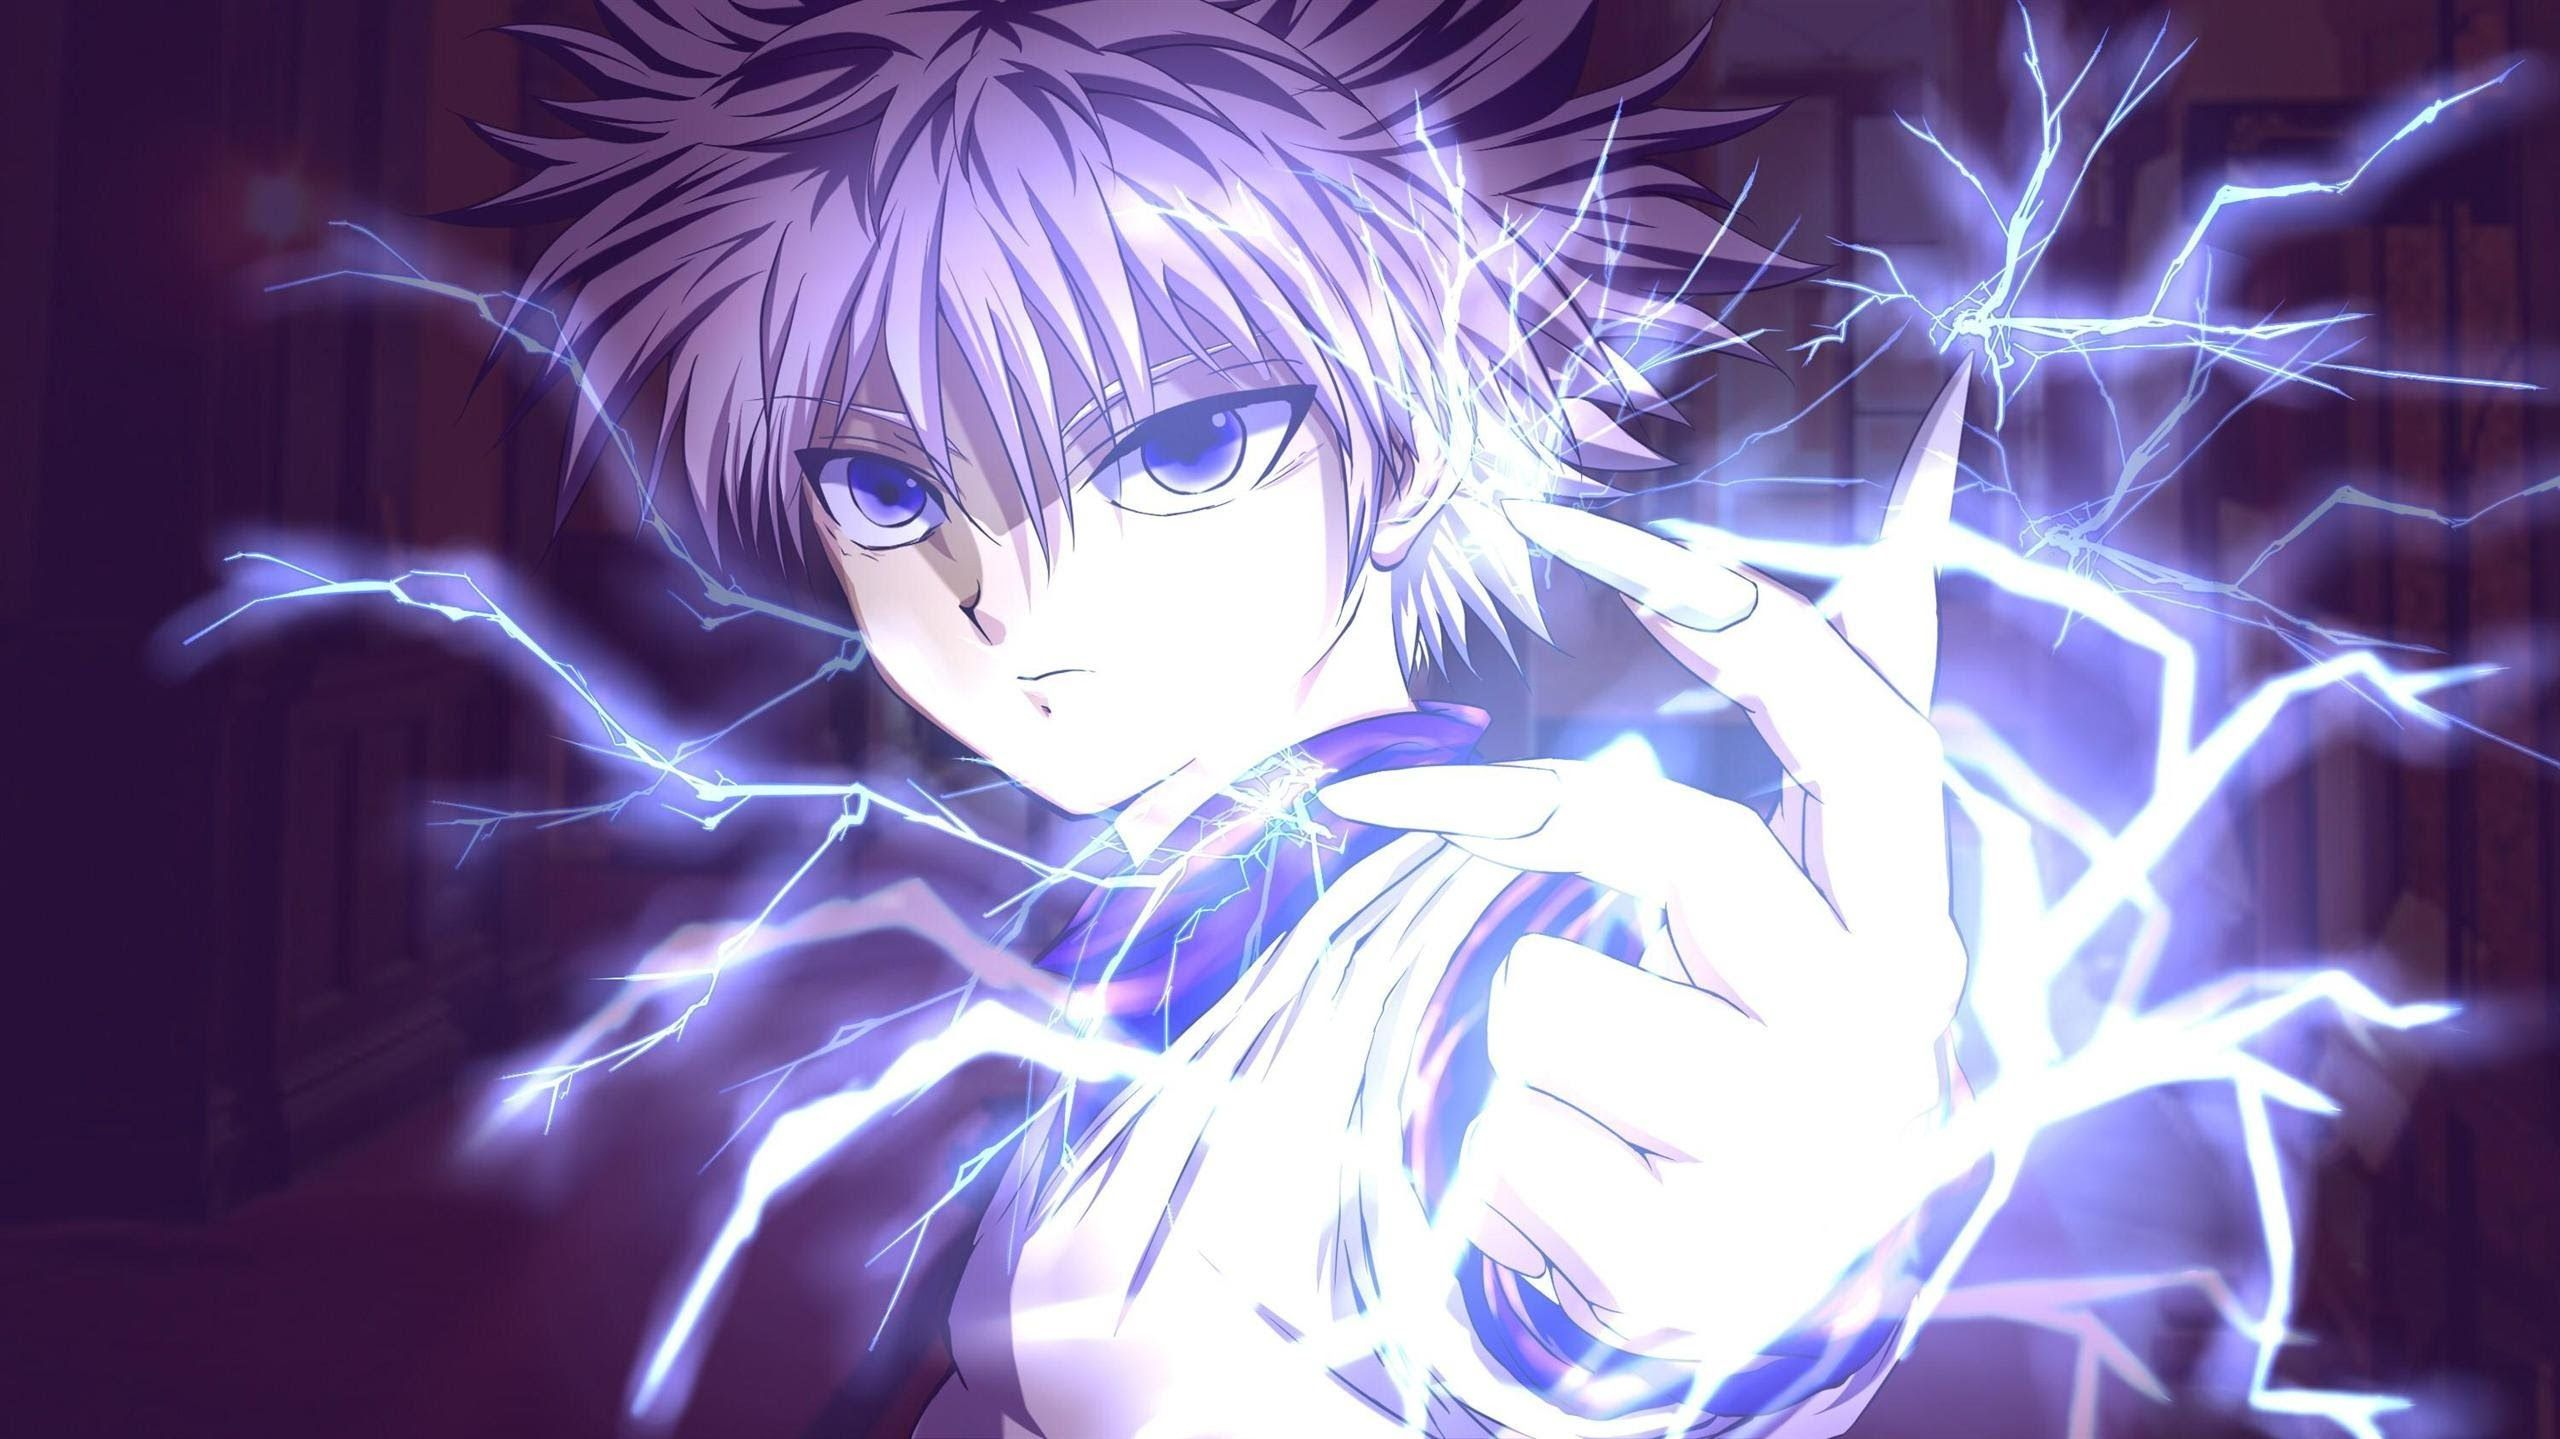 Killua Zoldyck Hunter X Hunter Anime Wallpaper Id 2590 Download Page Personagens De Anime Cenario Anime Papel De Parede Hd